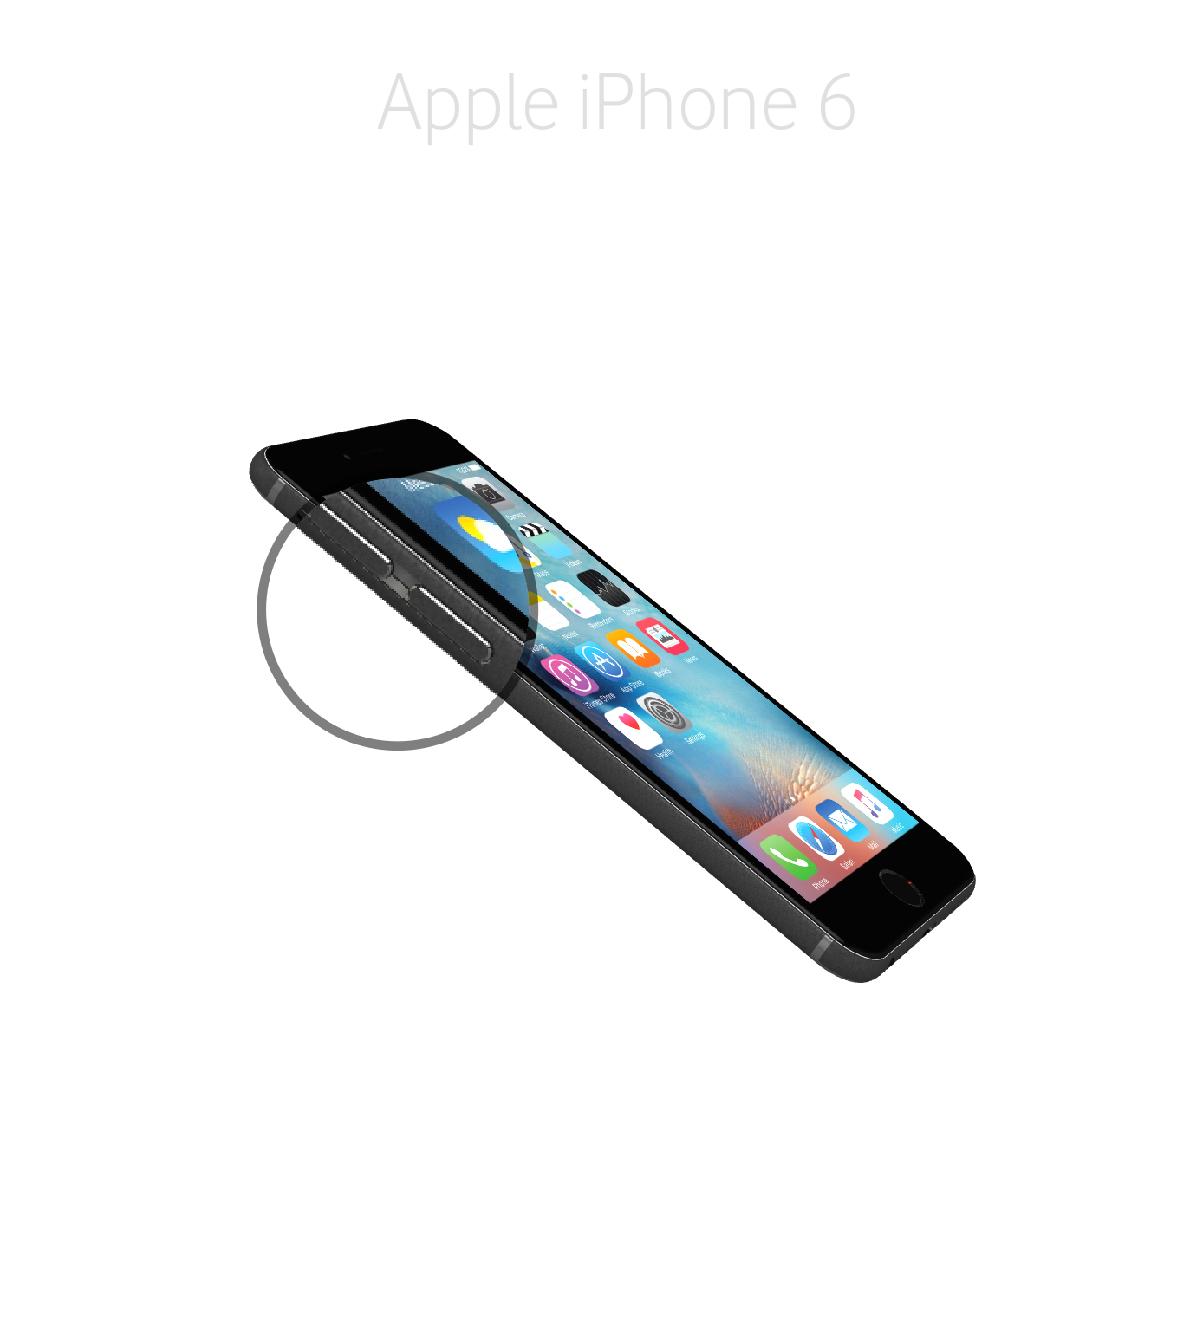 Laga volym/muteknapp iPhone 6